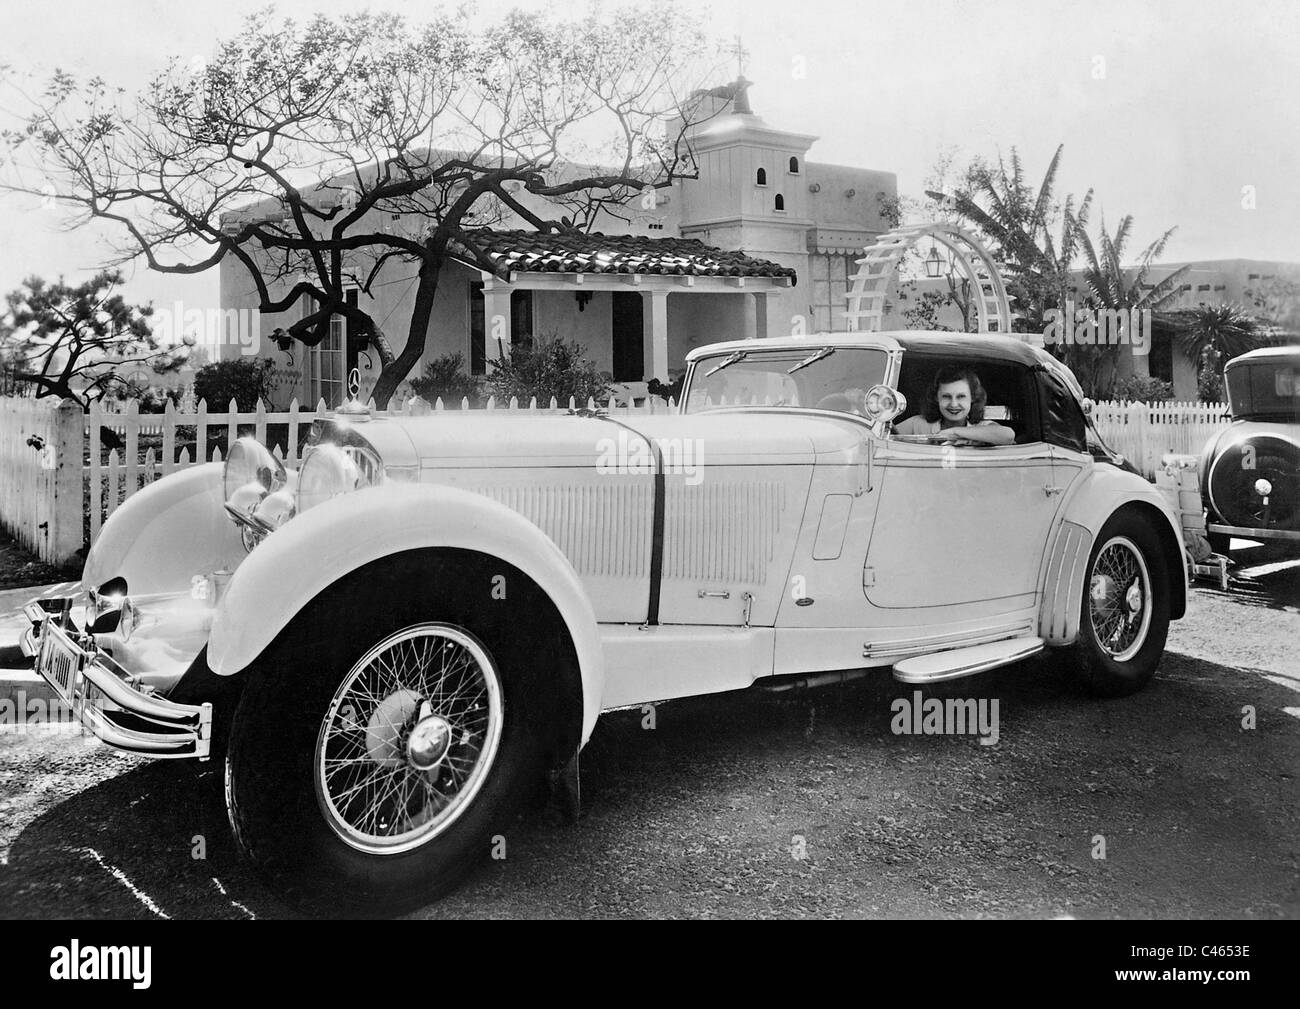 Lilian Harvey in her Mercedes Stock Photo: 37015090 - Alamy